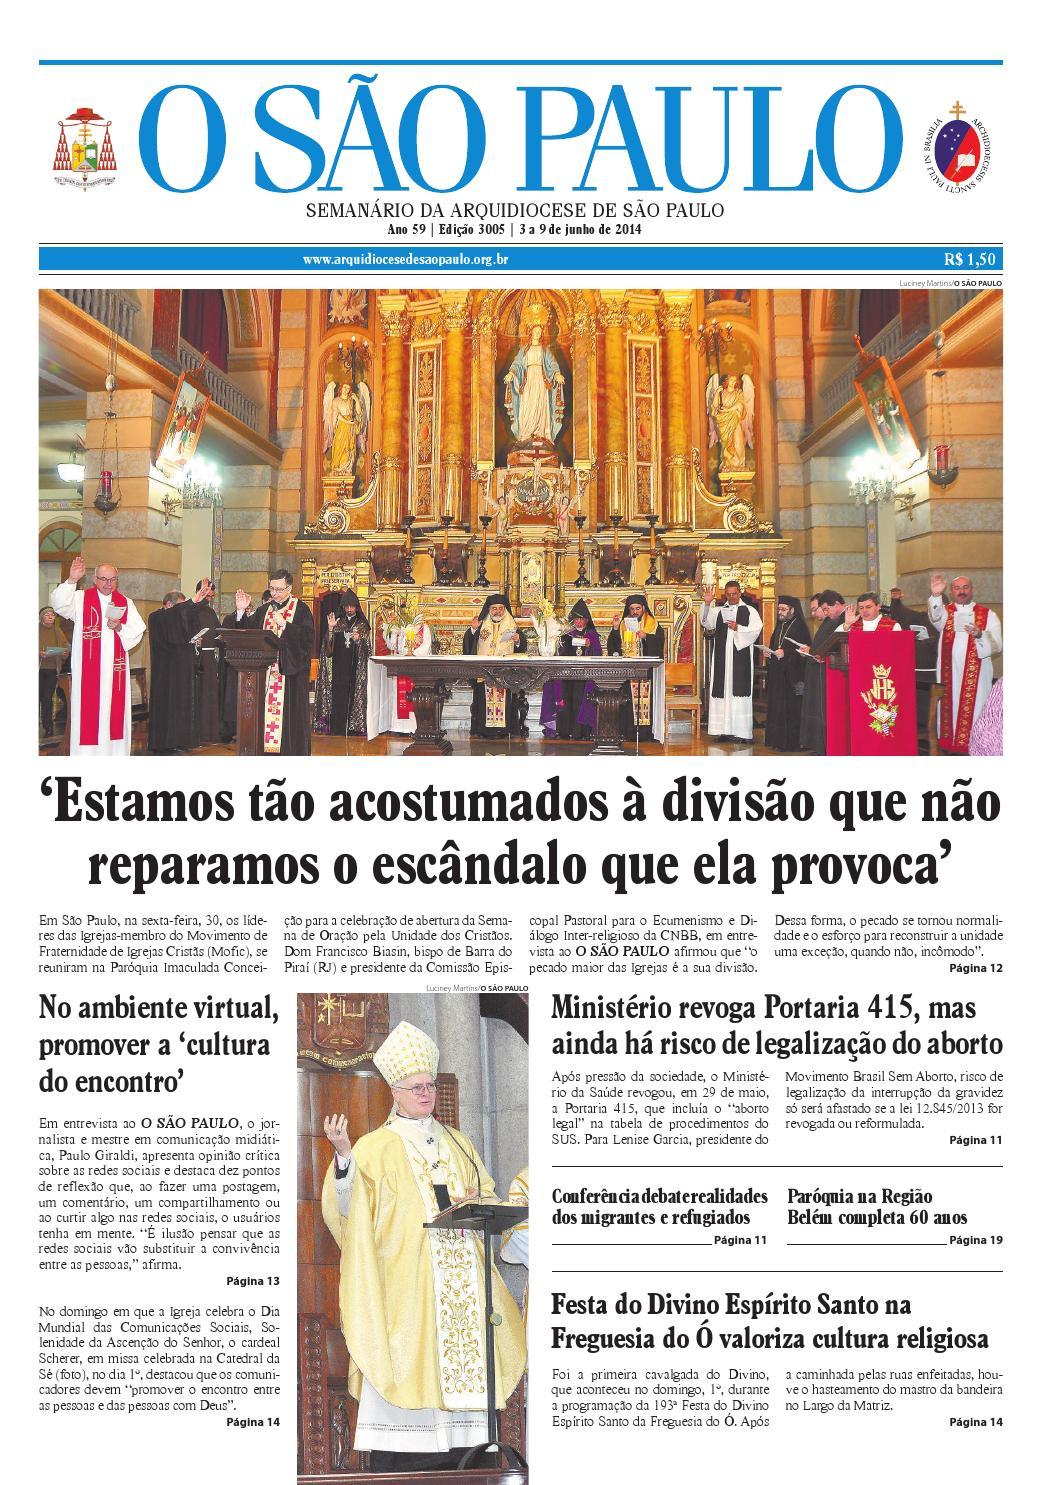 O SÃO PAULO - edição 3005 by jornal O SAO PAULO - issuu 30d9597c52442